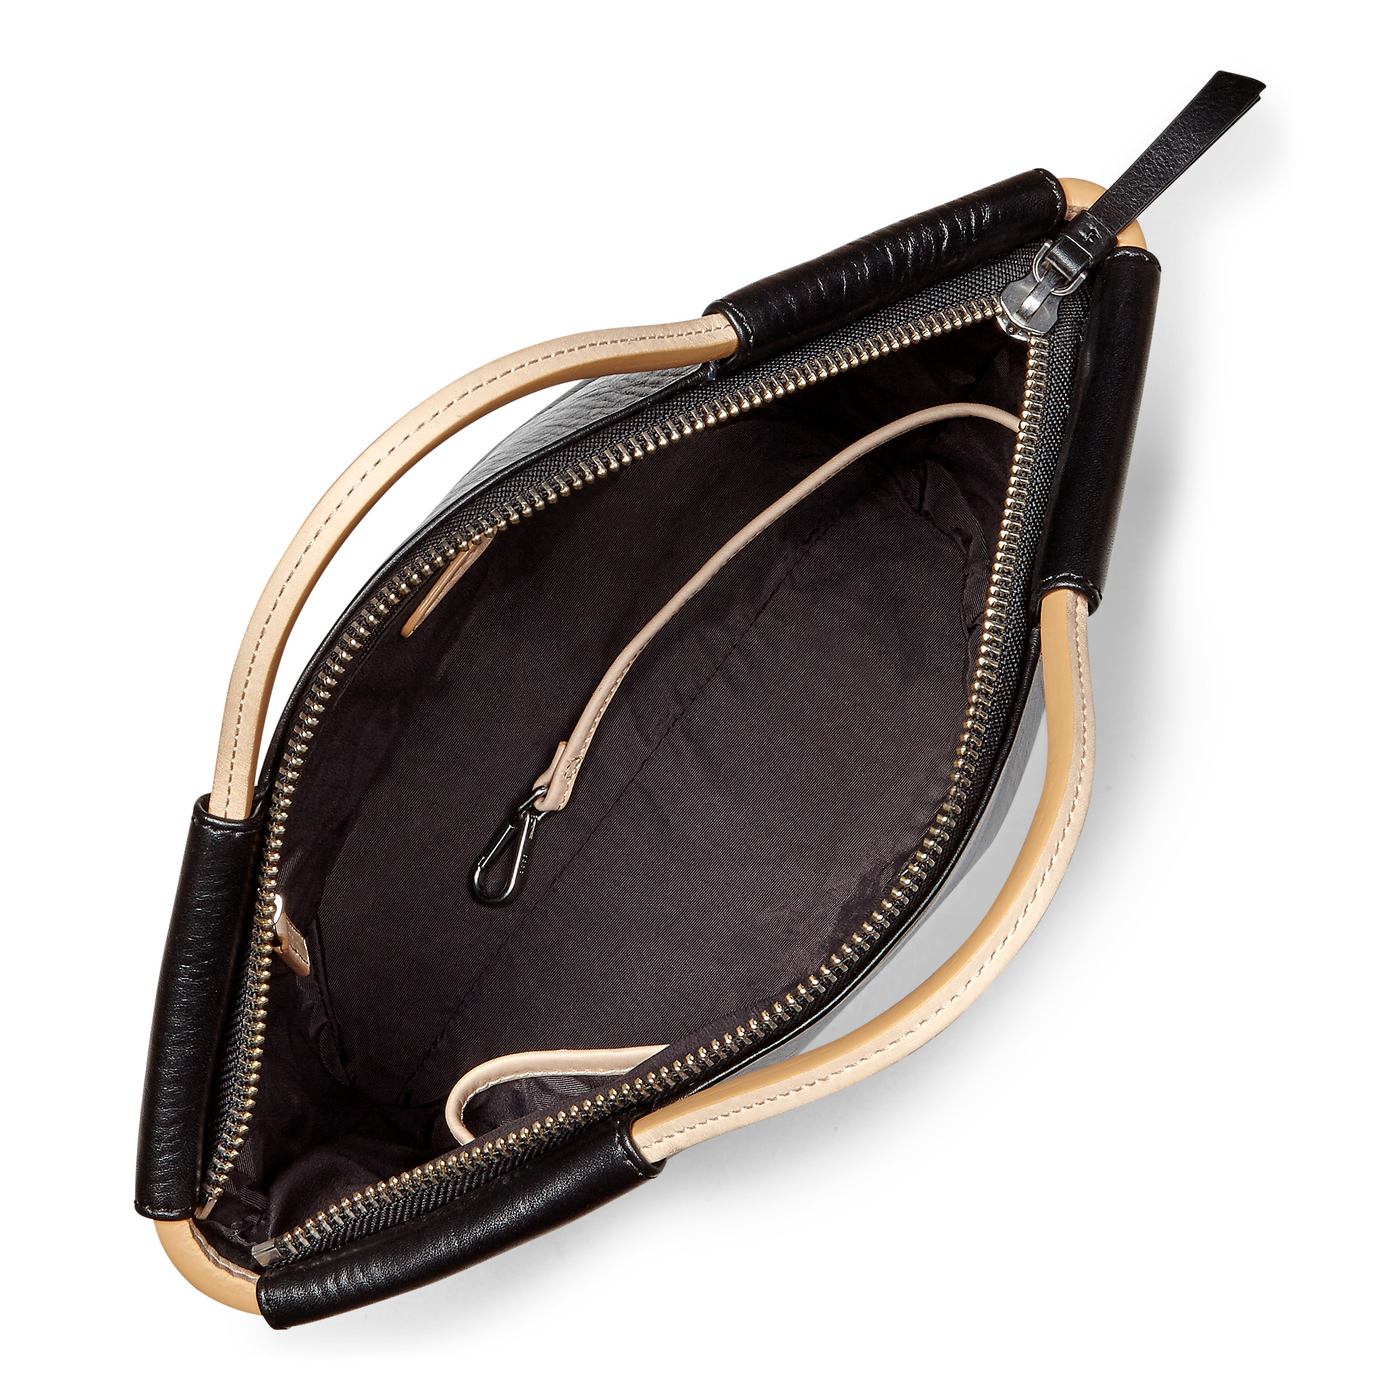 ECCO SP2 Vesper Medium Doctor's Bag